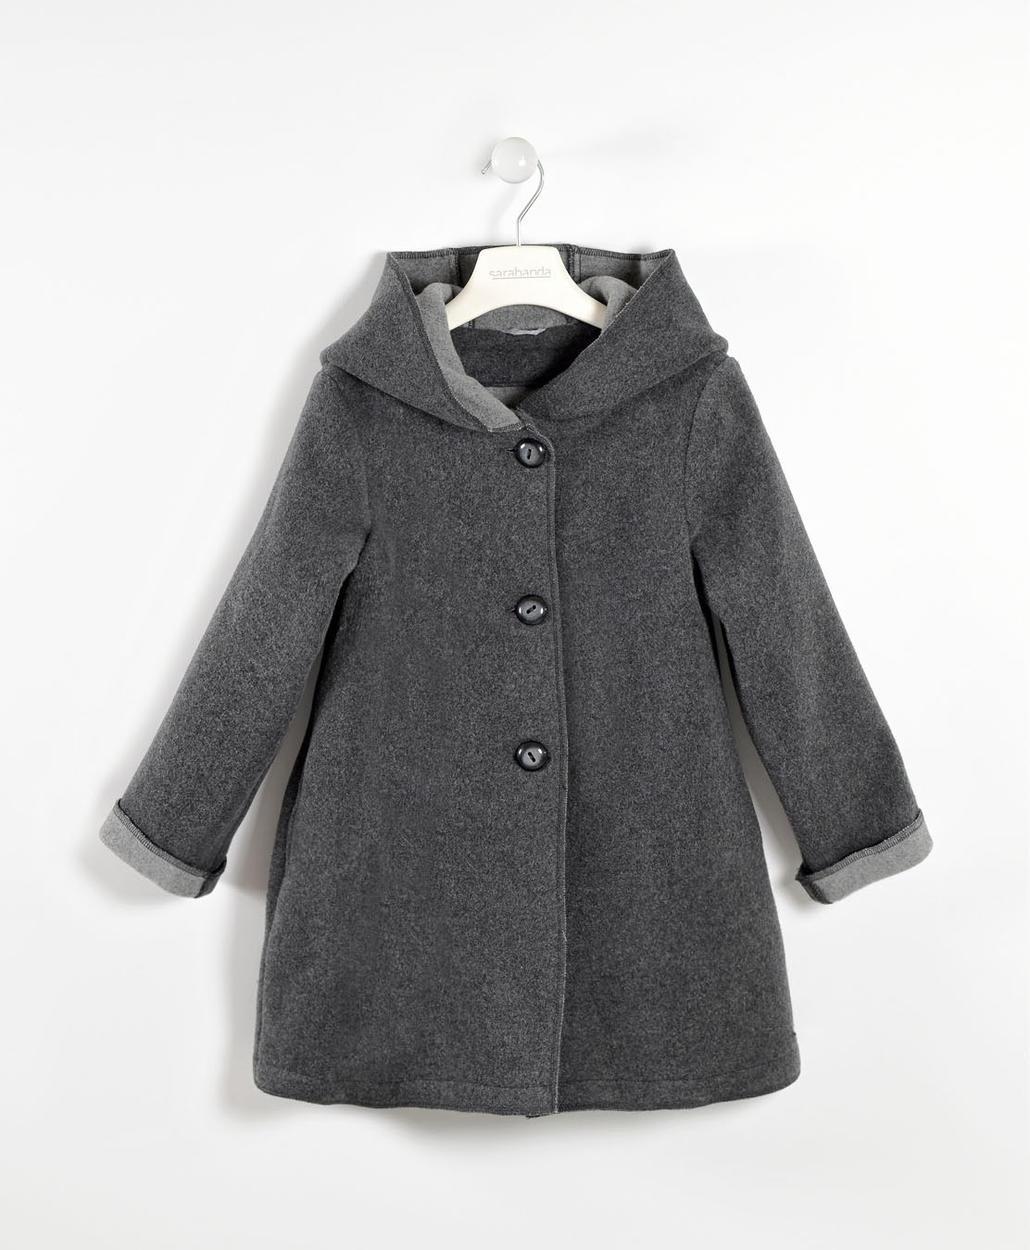 sports shoes 4c1a4 c1468 Morbido cappotto misto lana per bambina da 6 a 16 anni Sarabanda